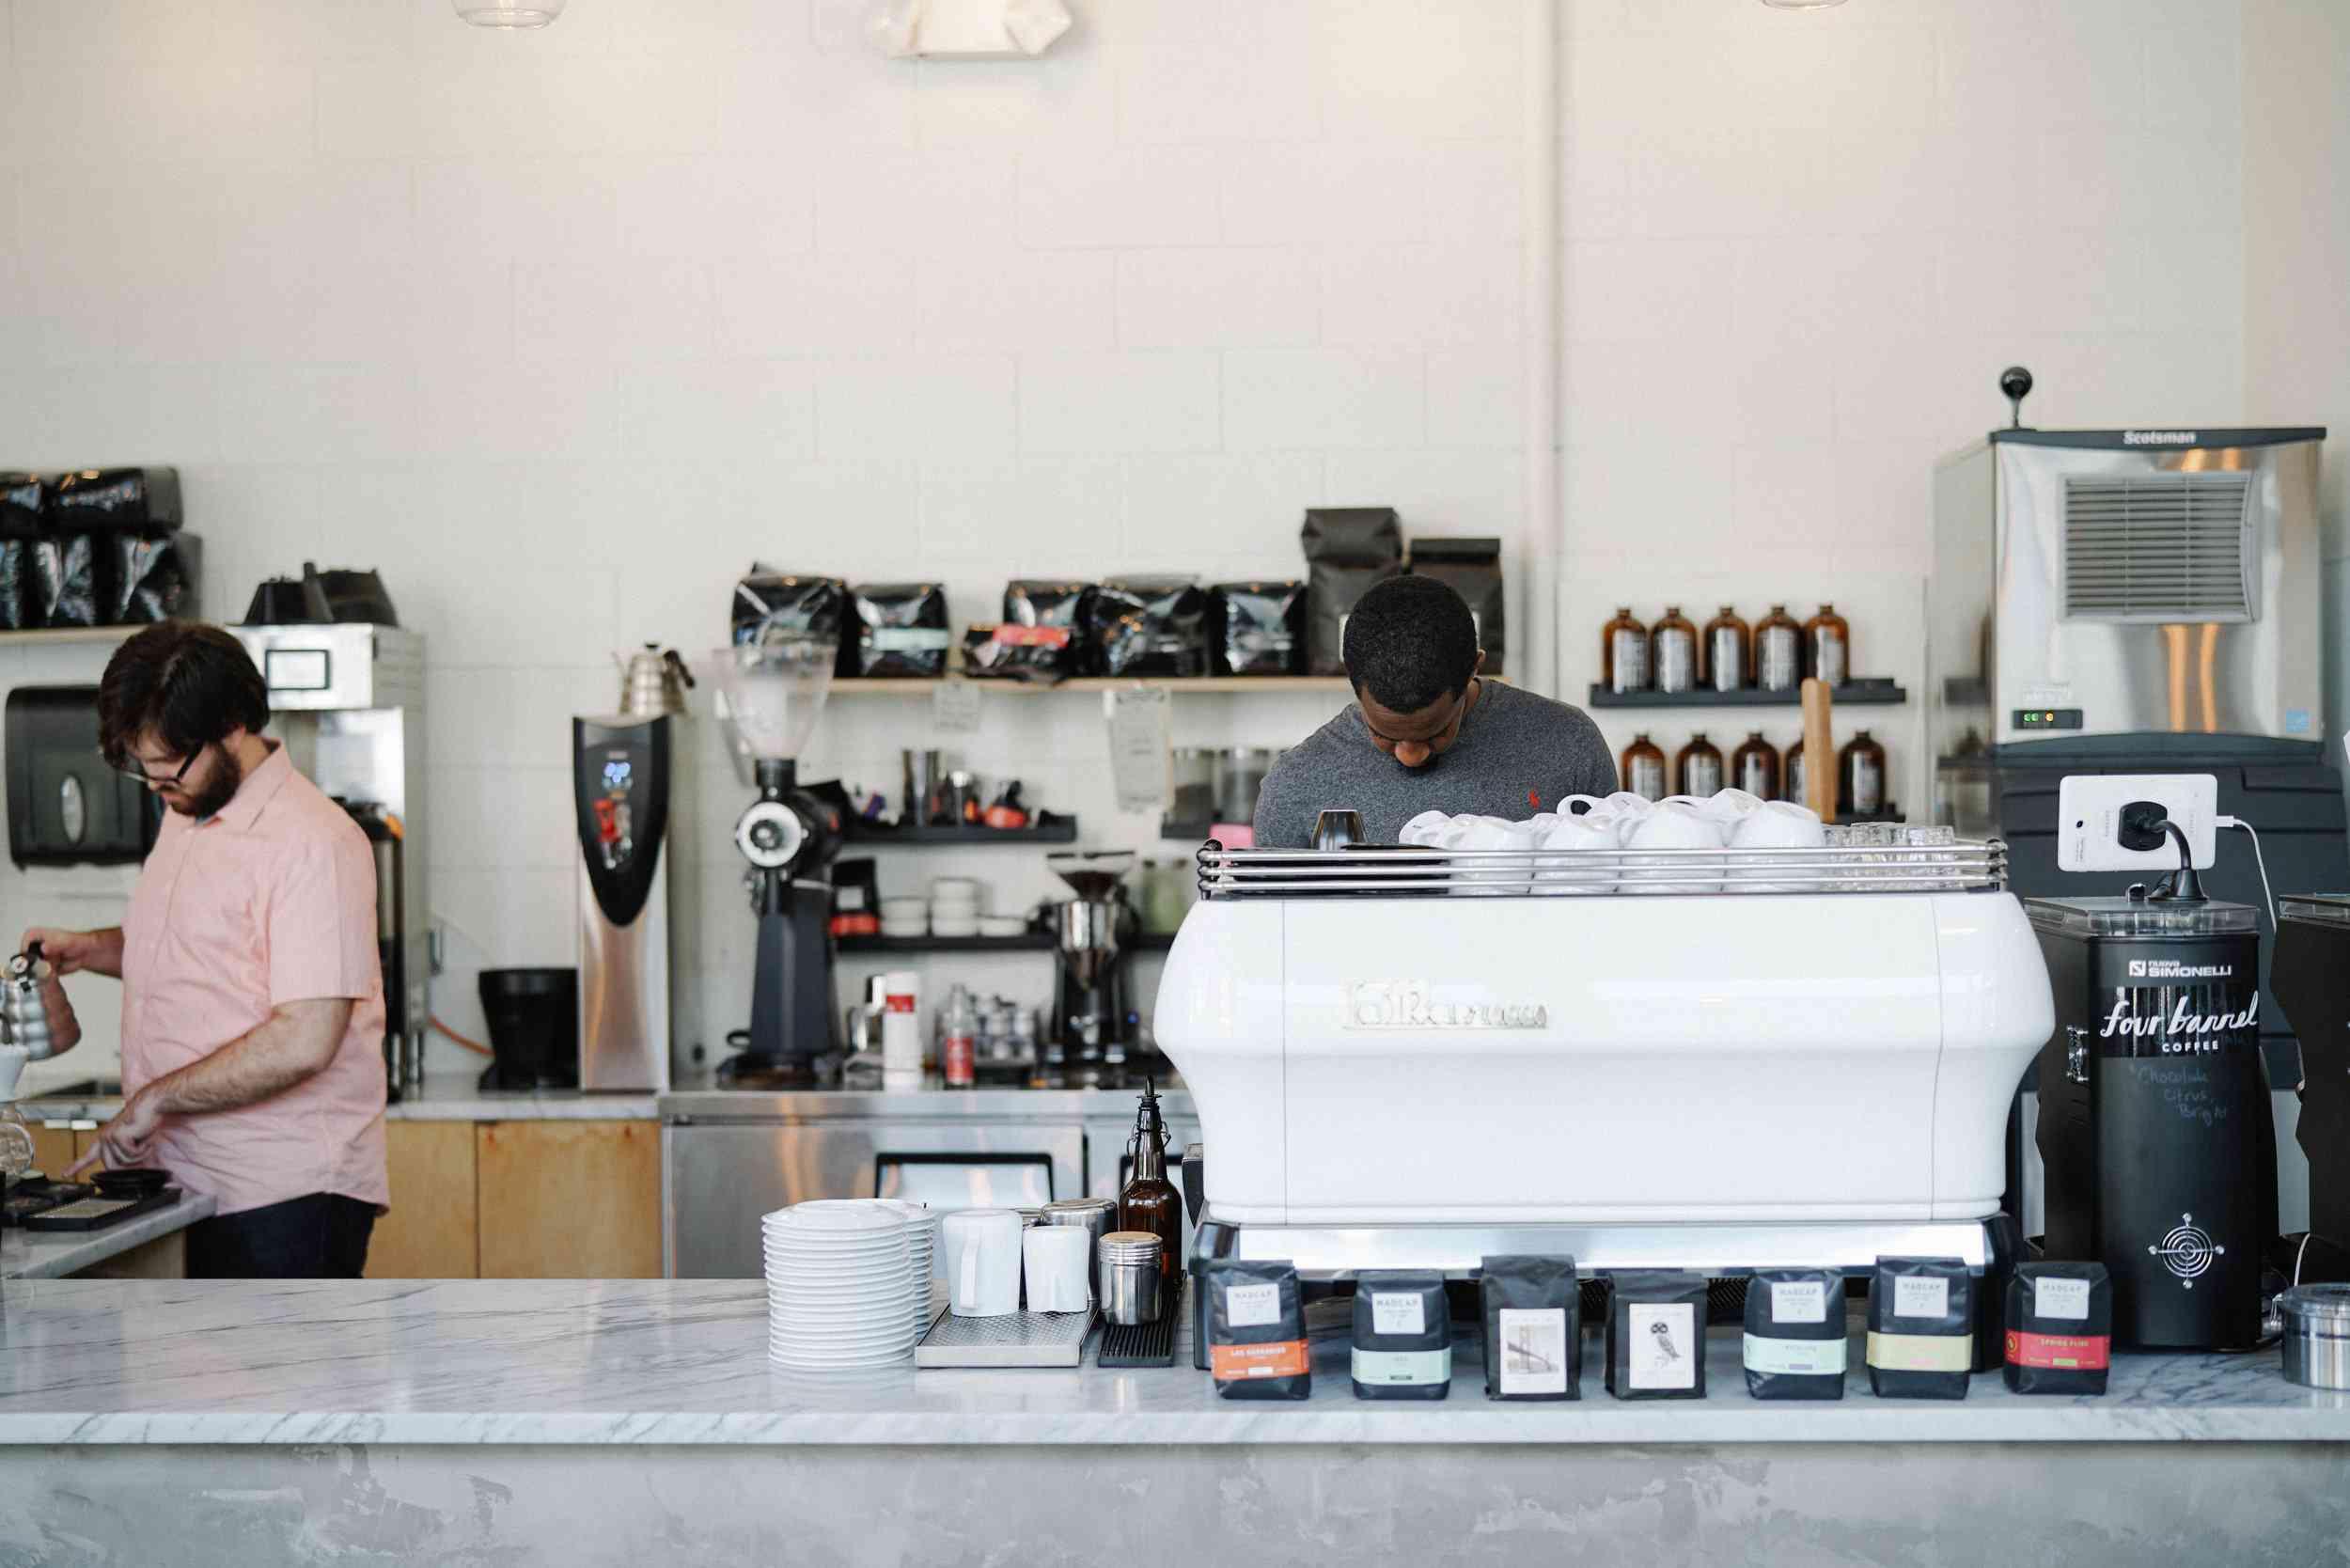 vice city cafe baristas working, miami